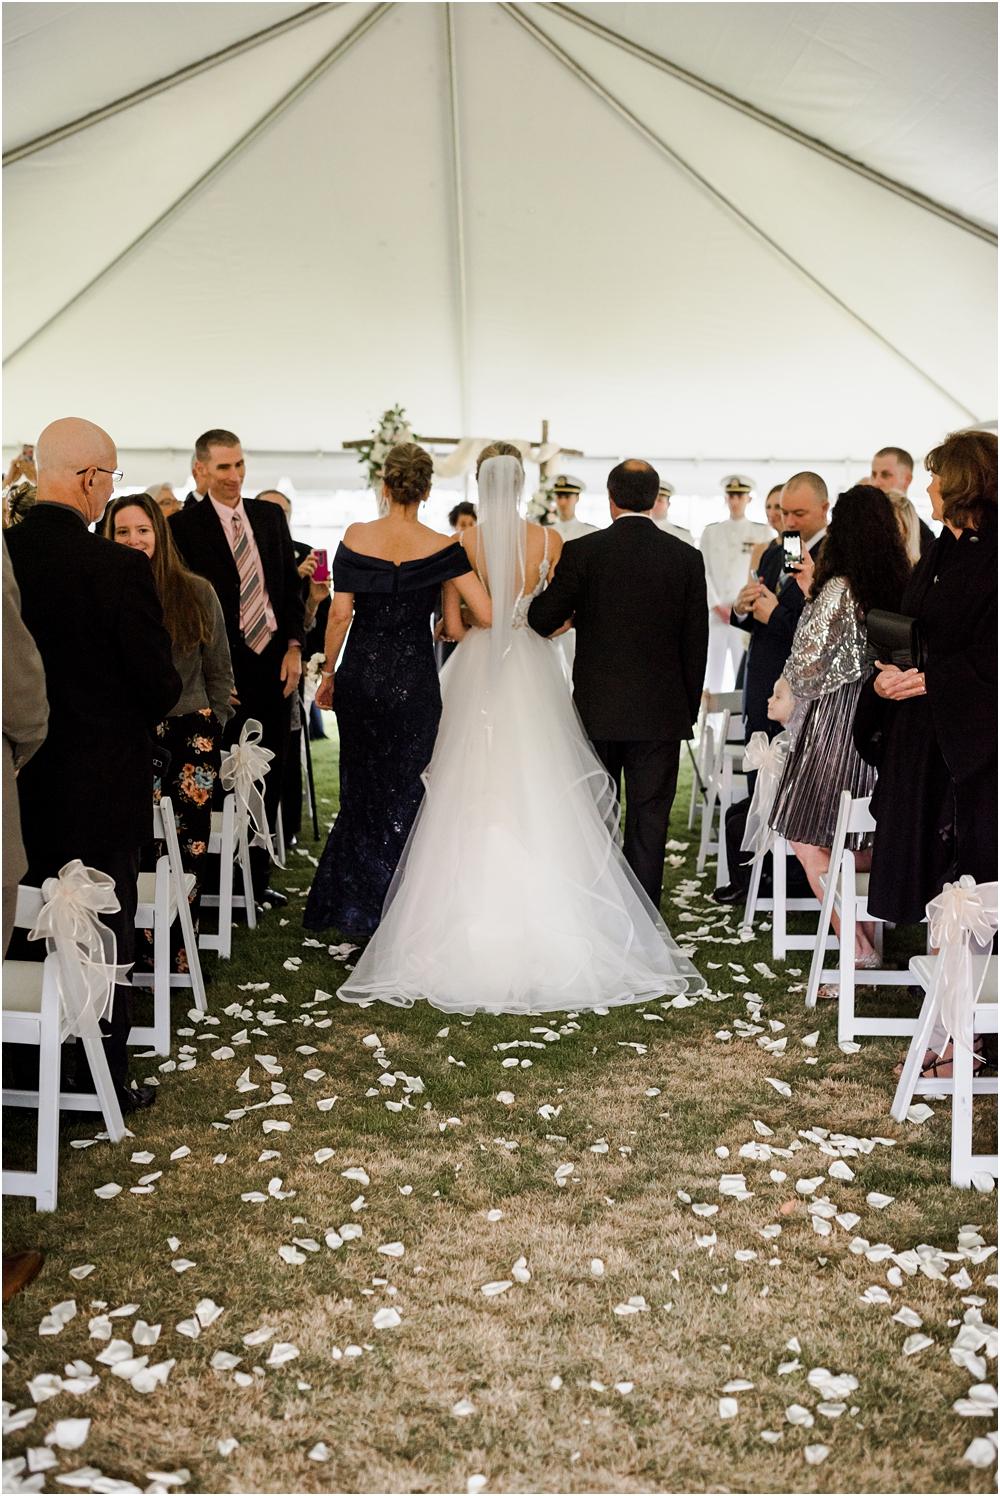 oconnor-pensacola-florida-wedding-photographer-kiersten-taylor-52.jpg